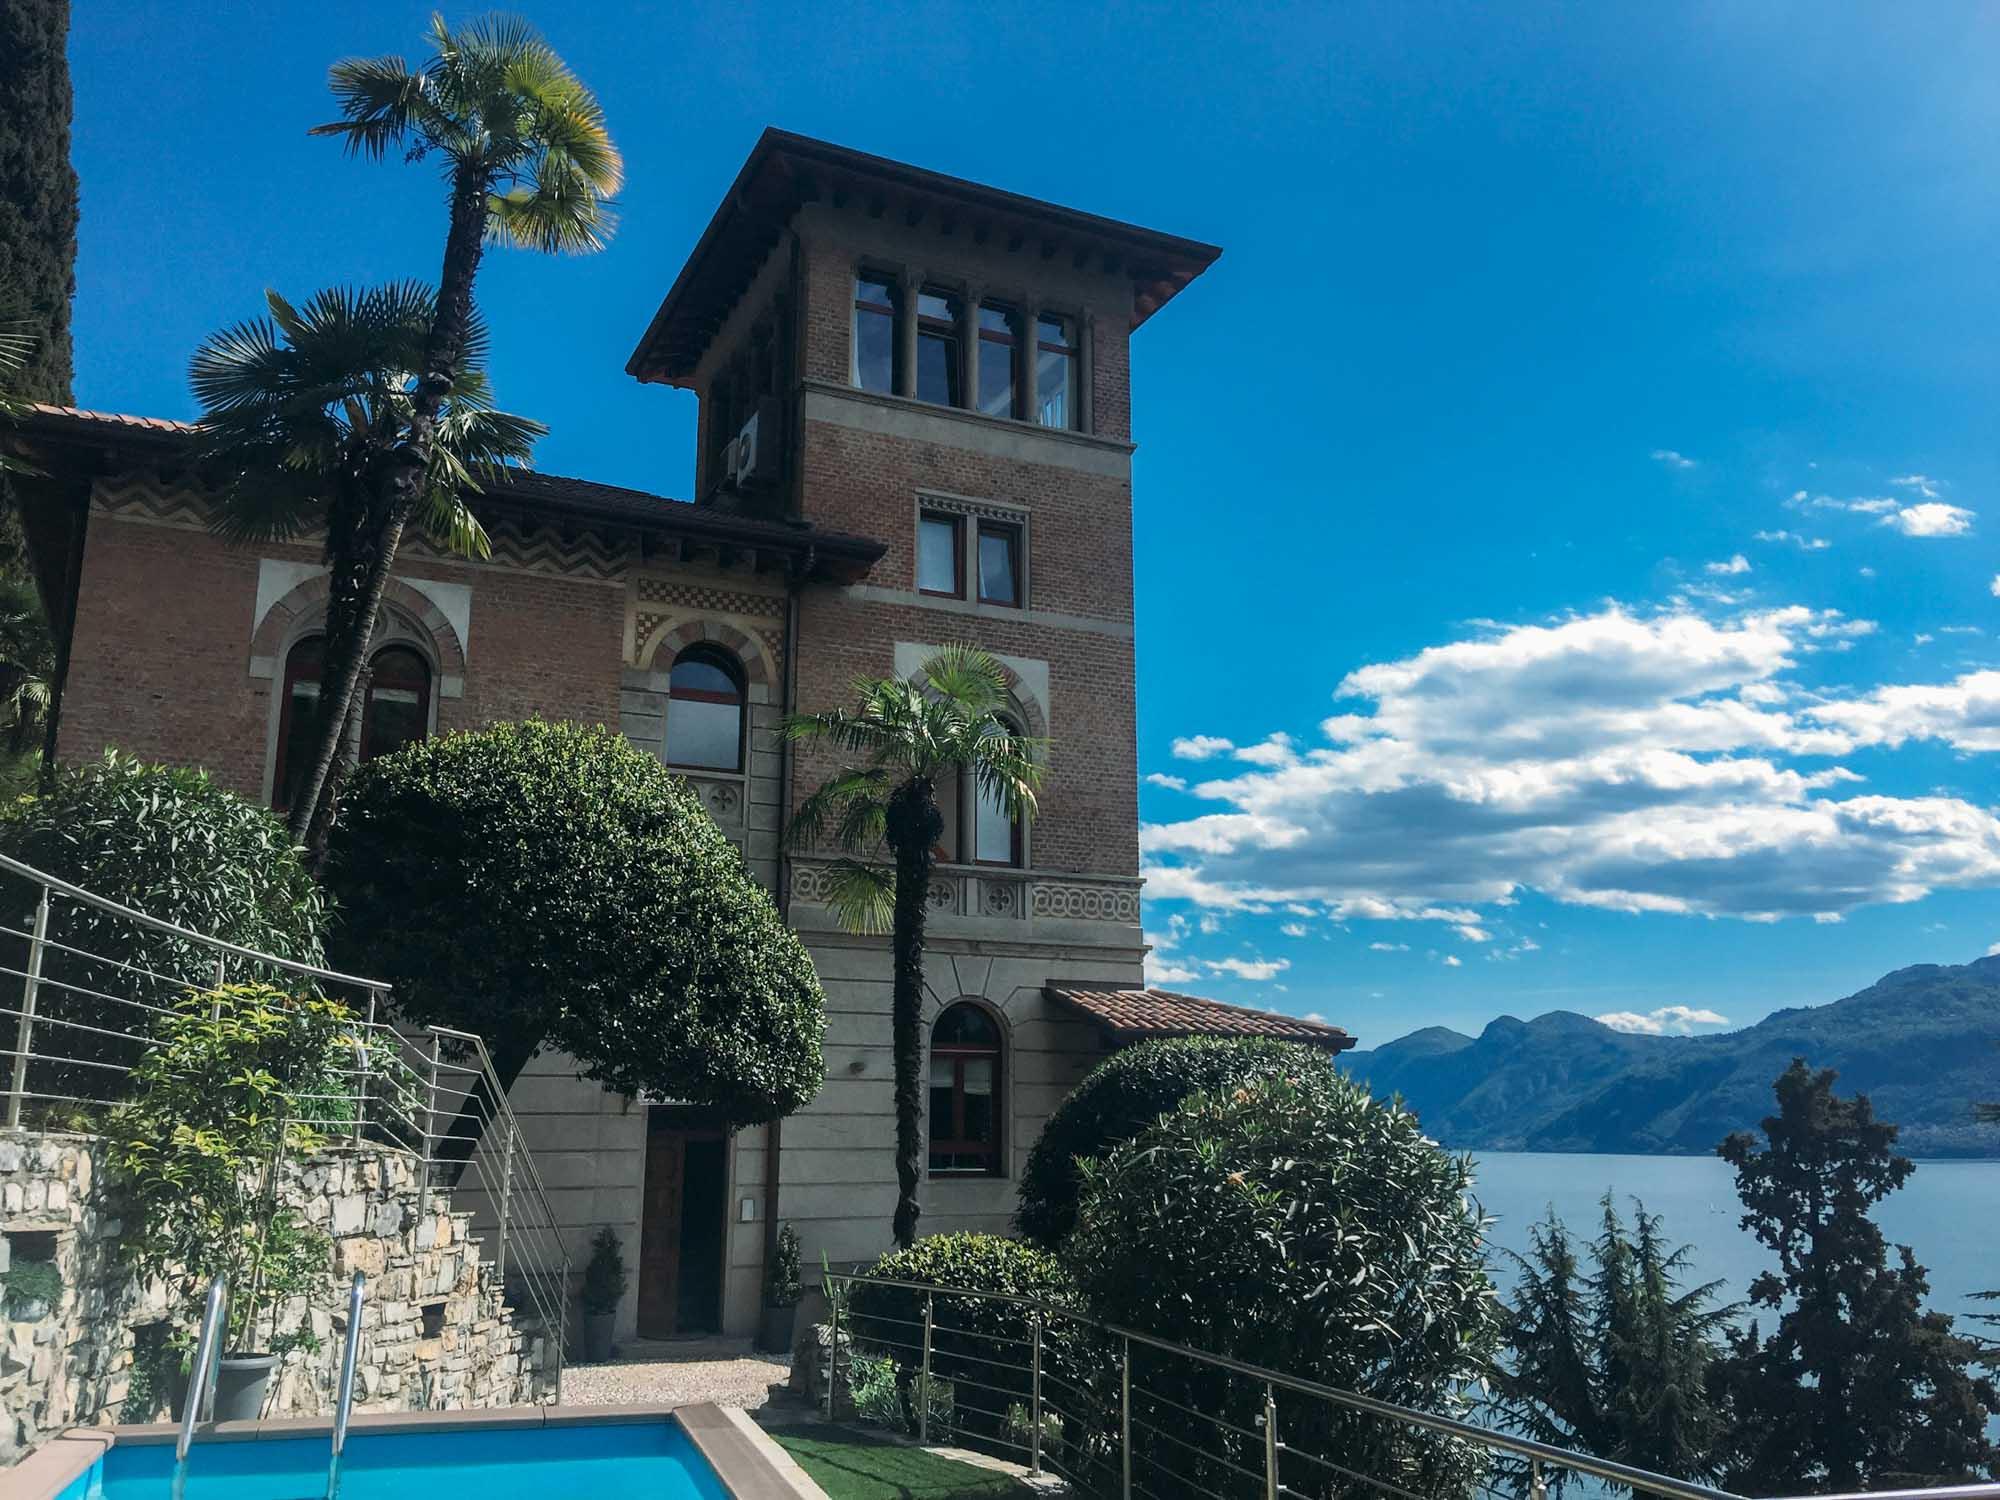 Europe Road Trip-Villa Monti, Varenna